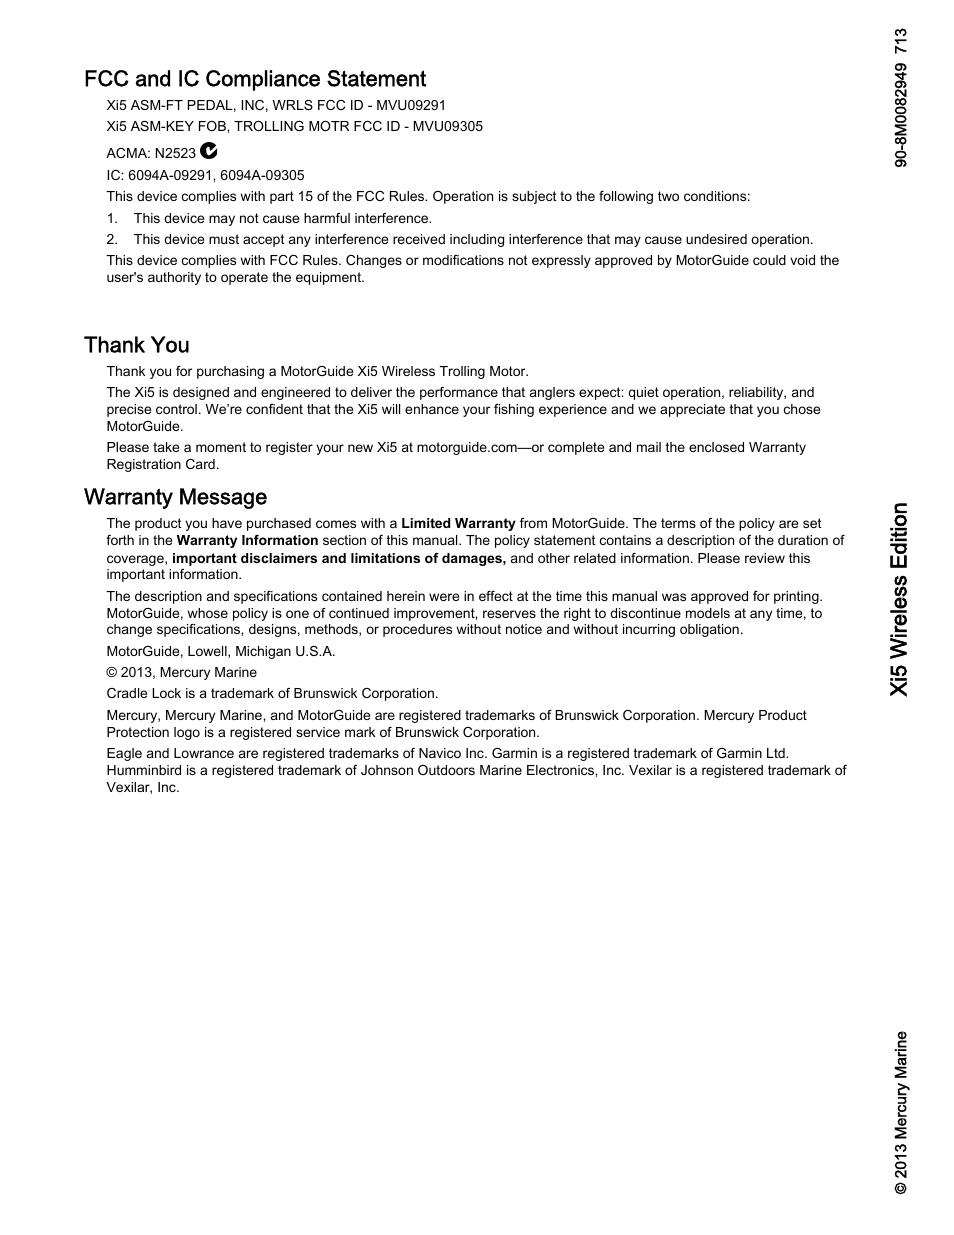 MotorGuide Xi5 Wireless Trolling Motor User Manual | 38 pages